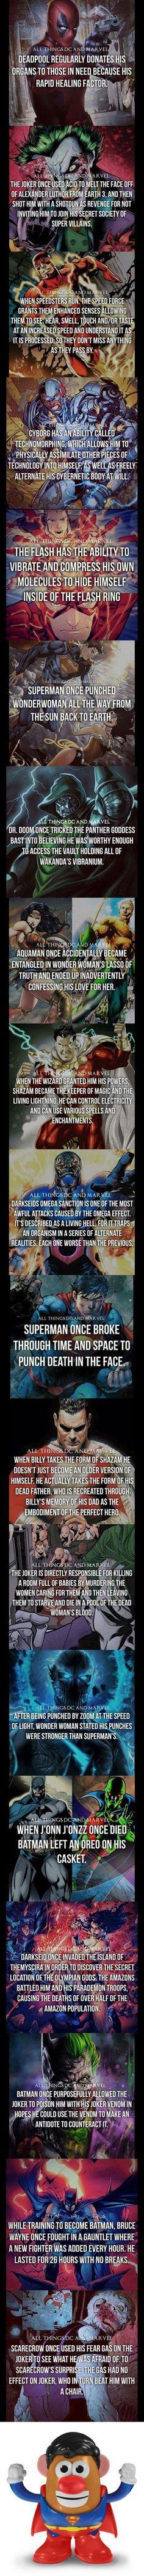 Some superhero/supervillain facts - 9GAG